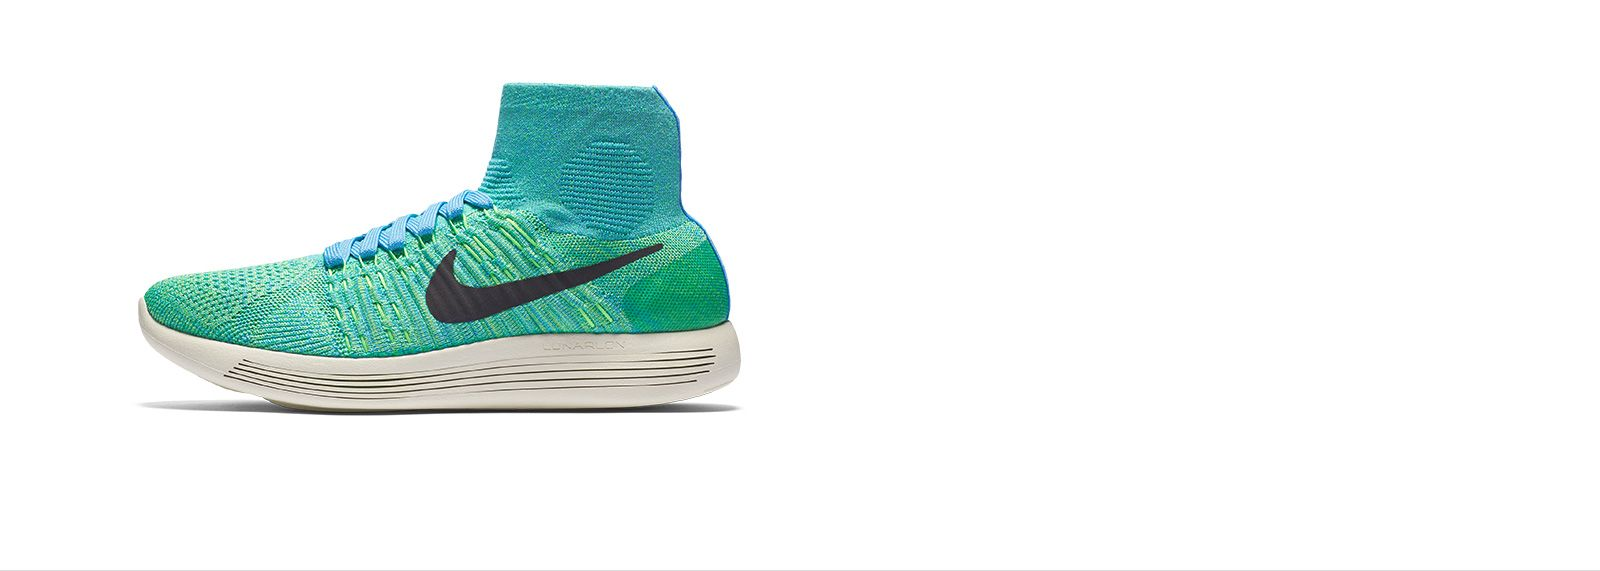 Nike running knit